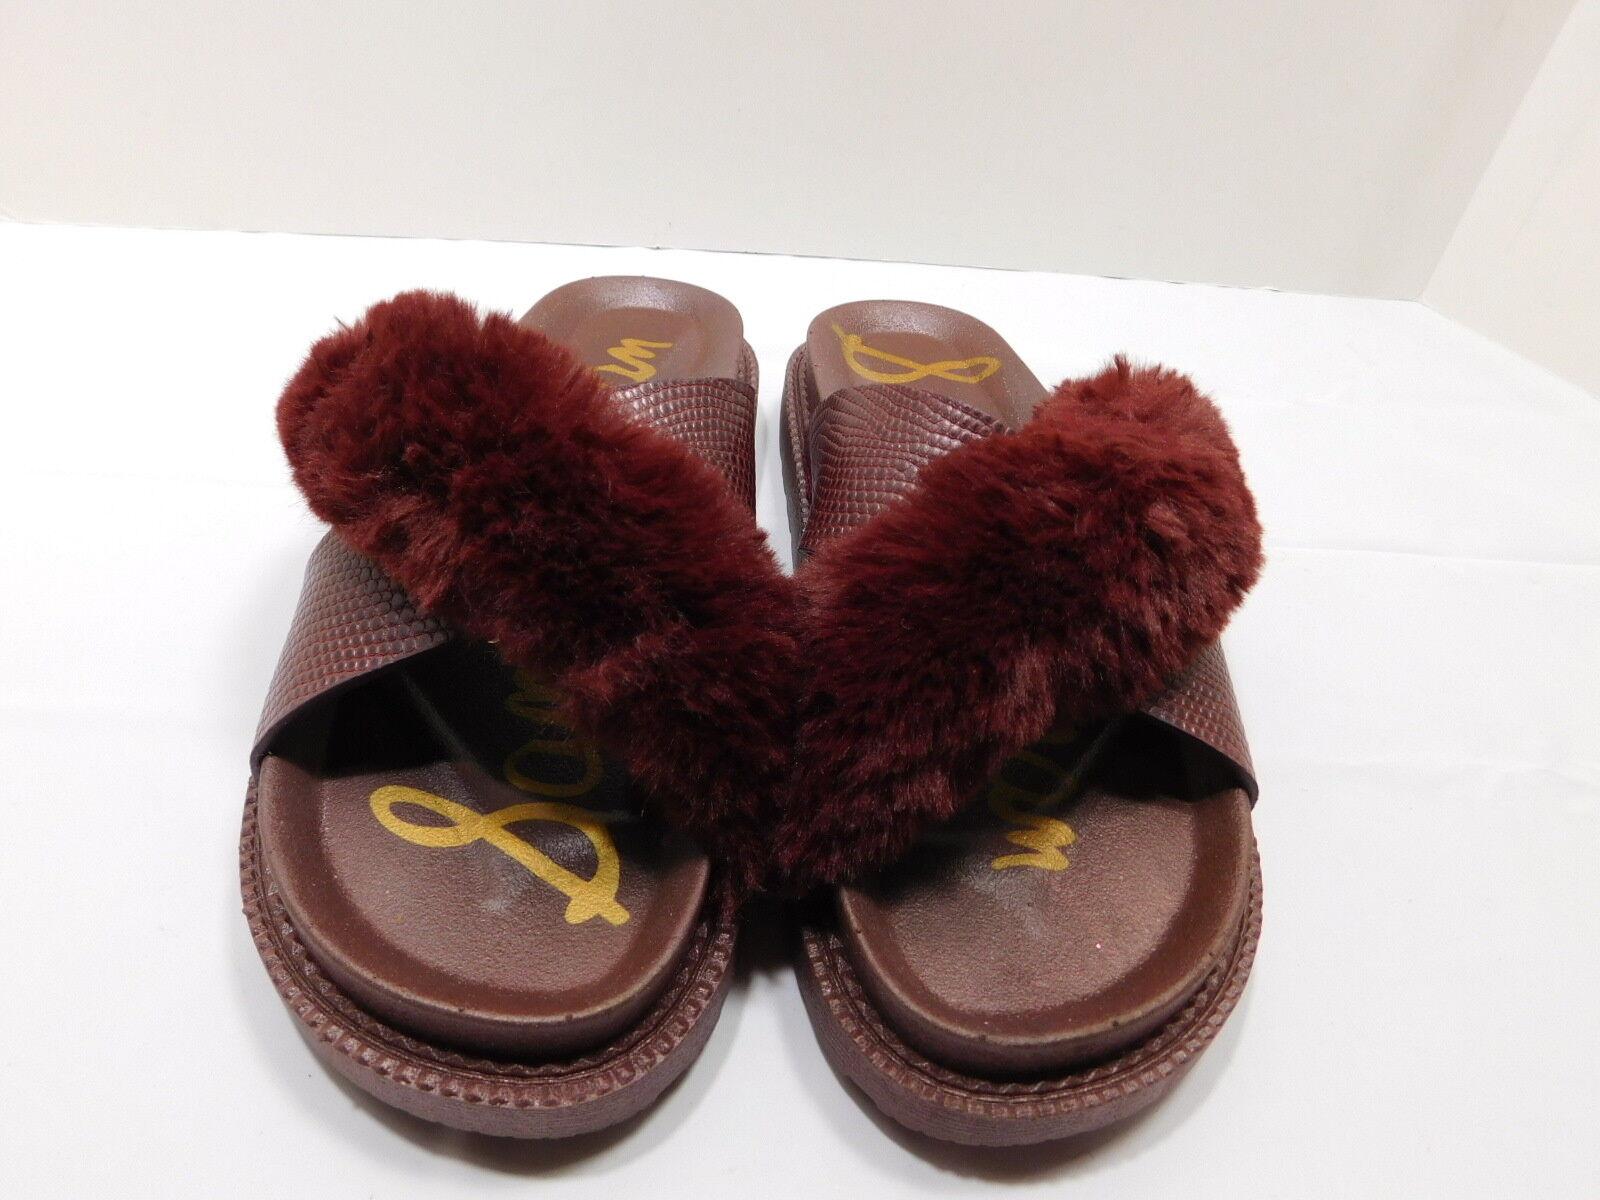 New  Sam Edelman Burgundy Faux Fur & Textured Leather  Slides.....7 M  37 EUR